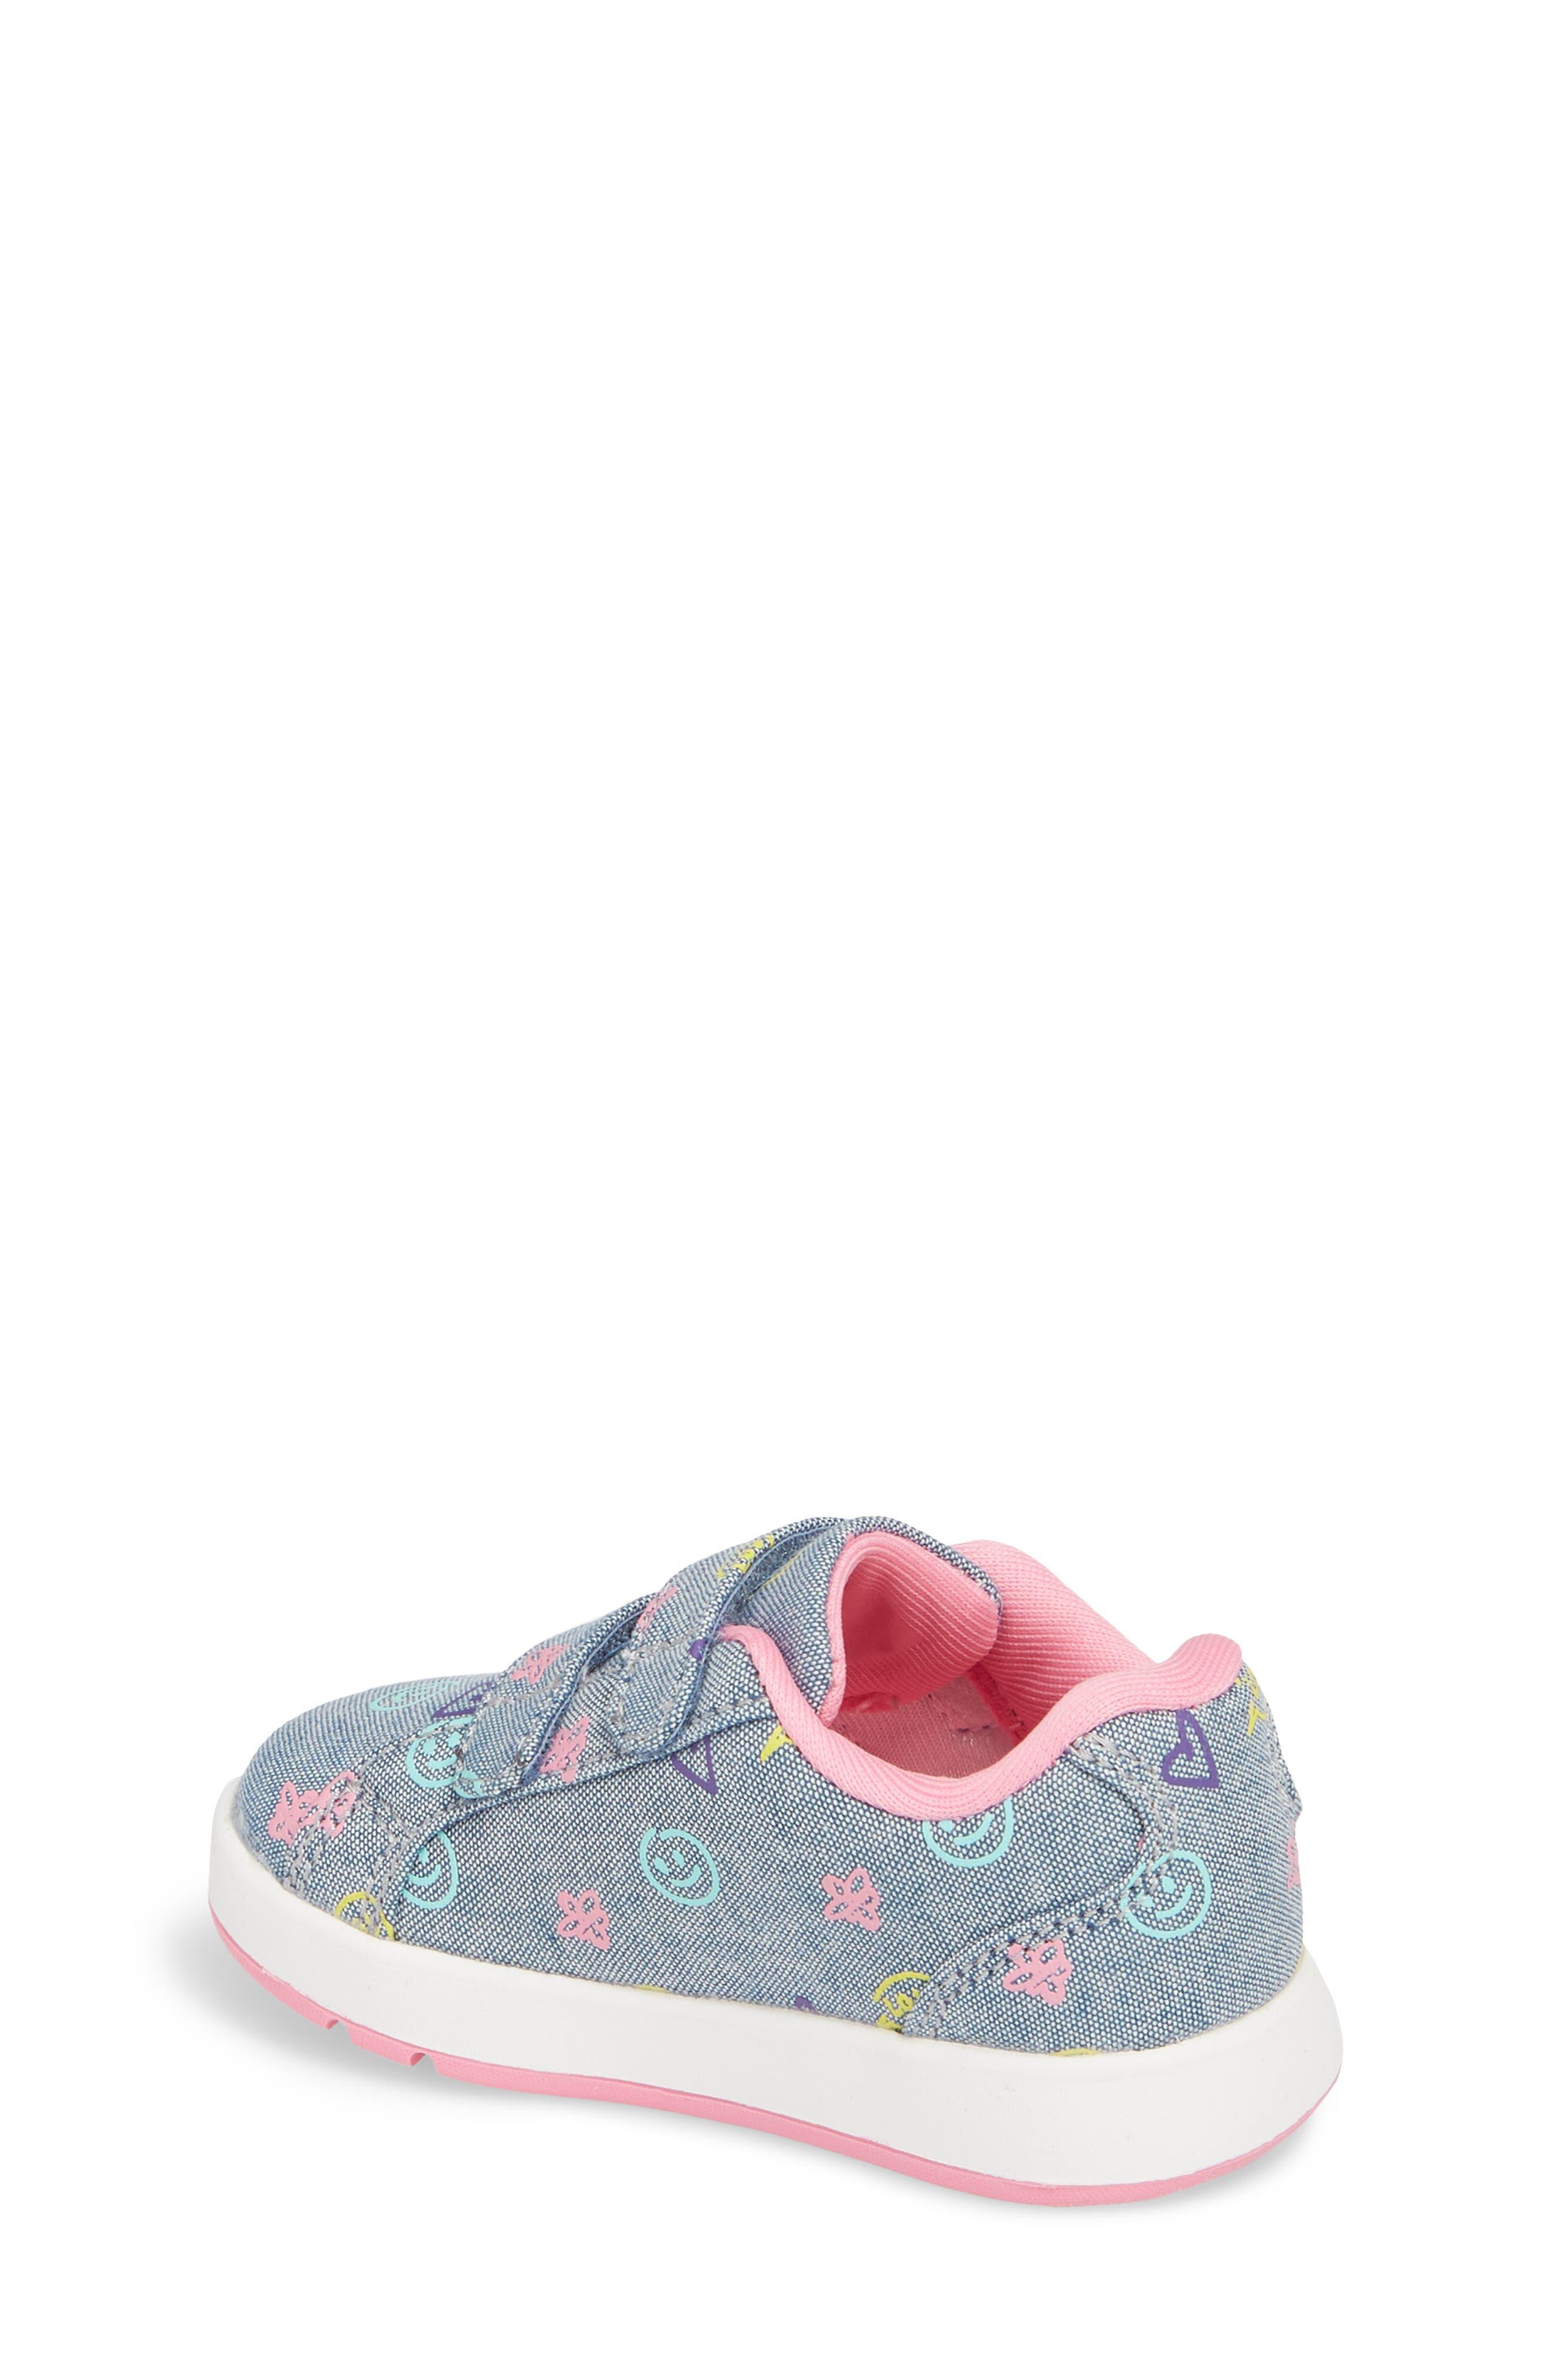 Kate Print Sneaker,                             Alternate thumbnail 2, color,                             400